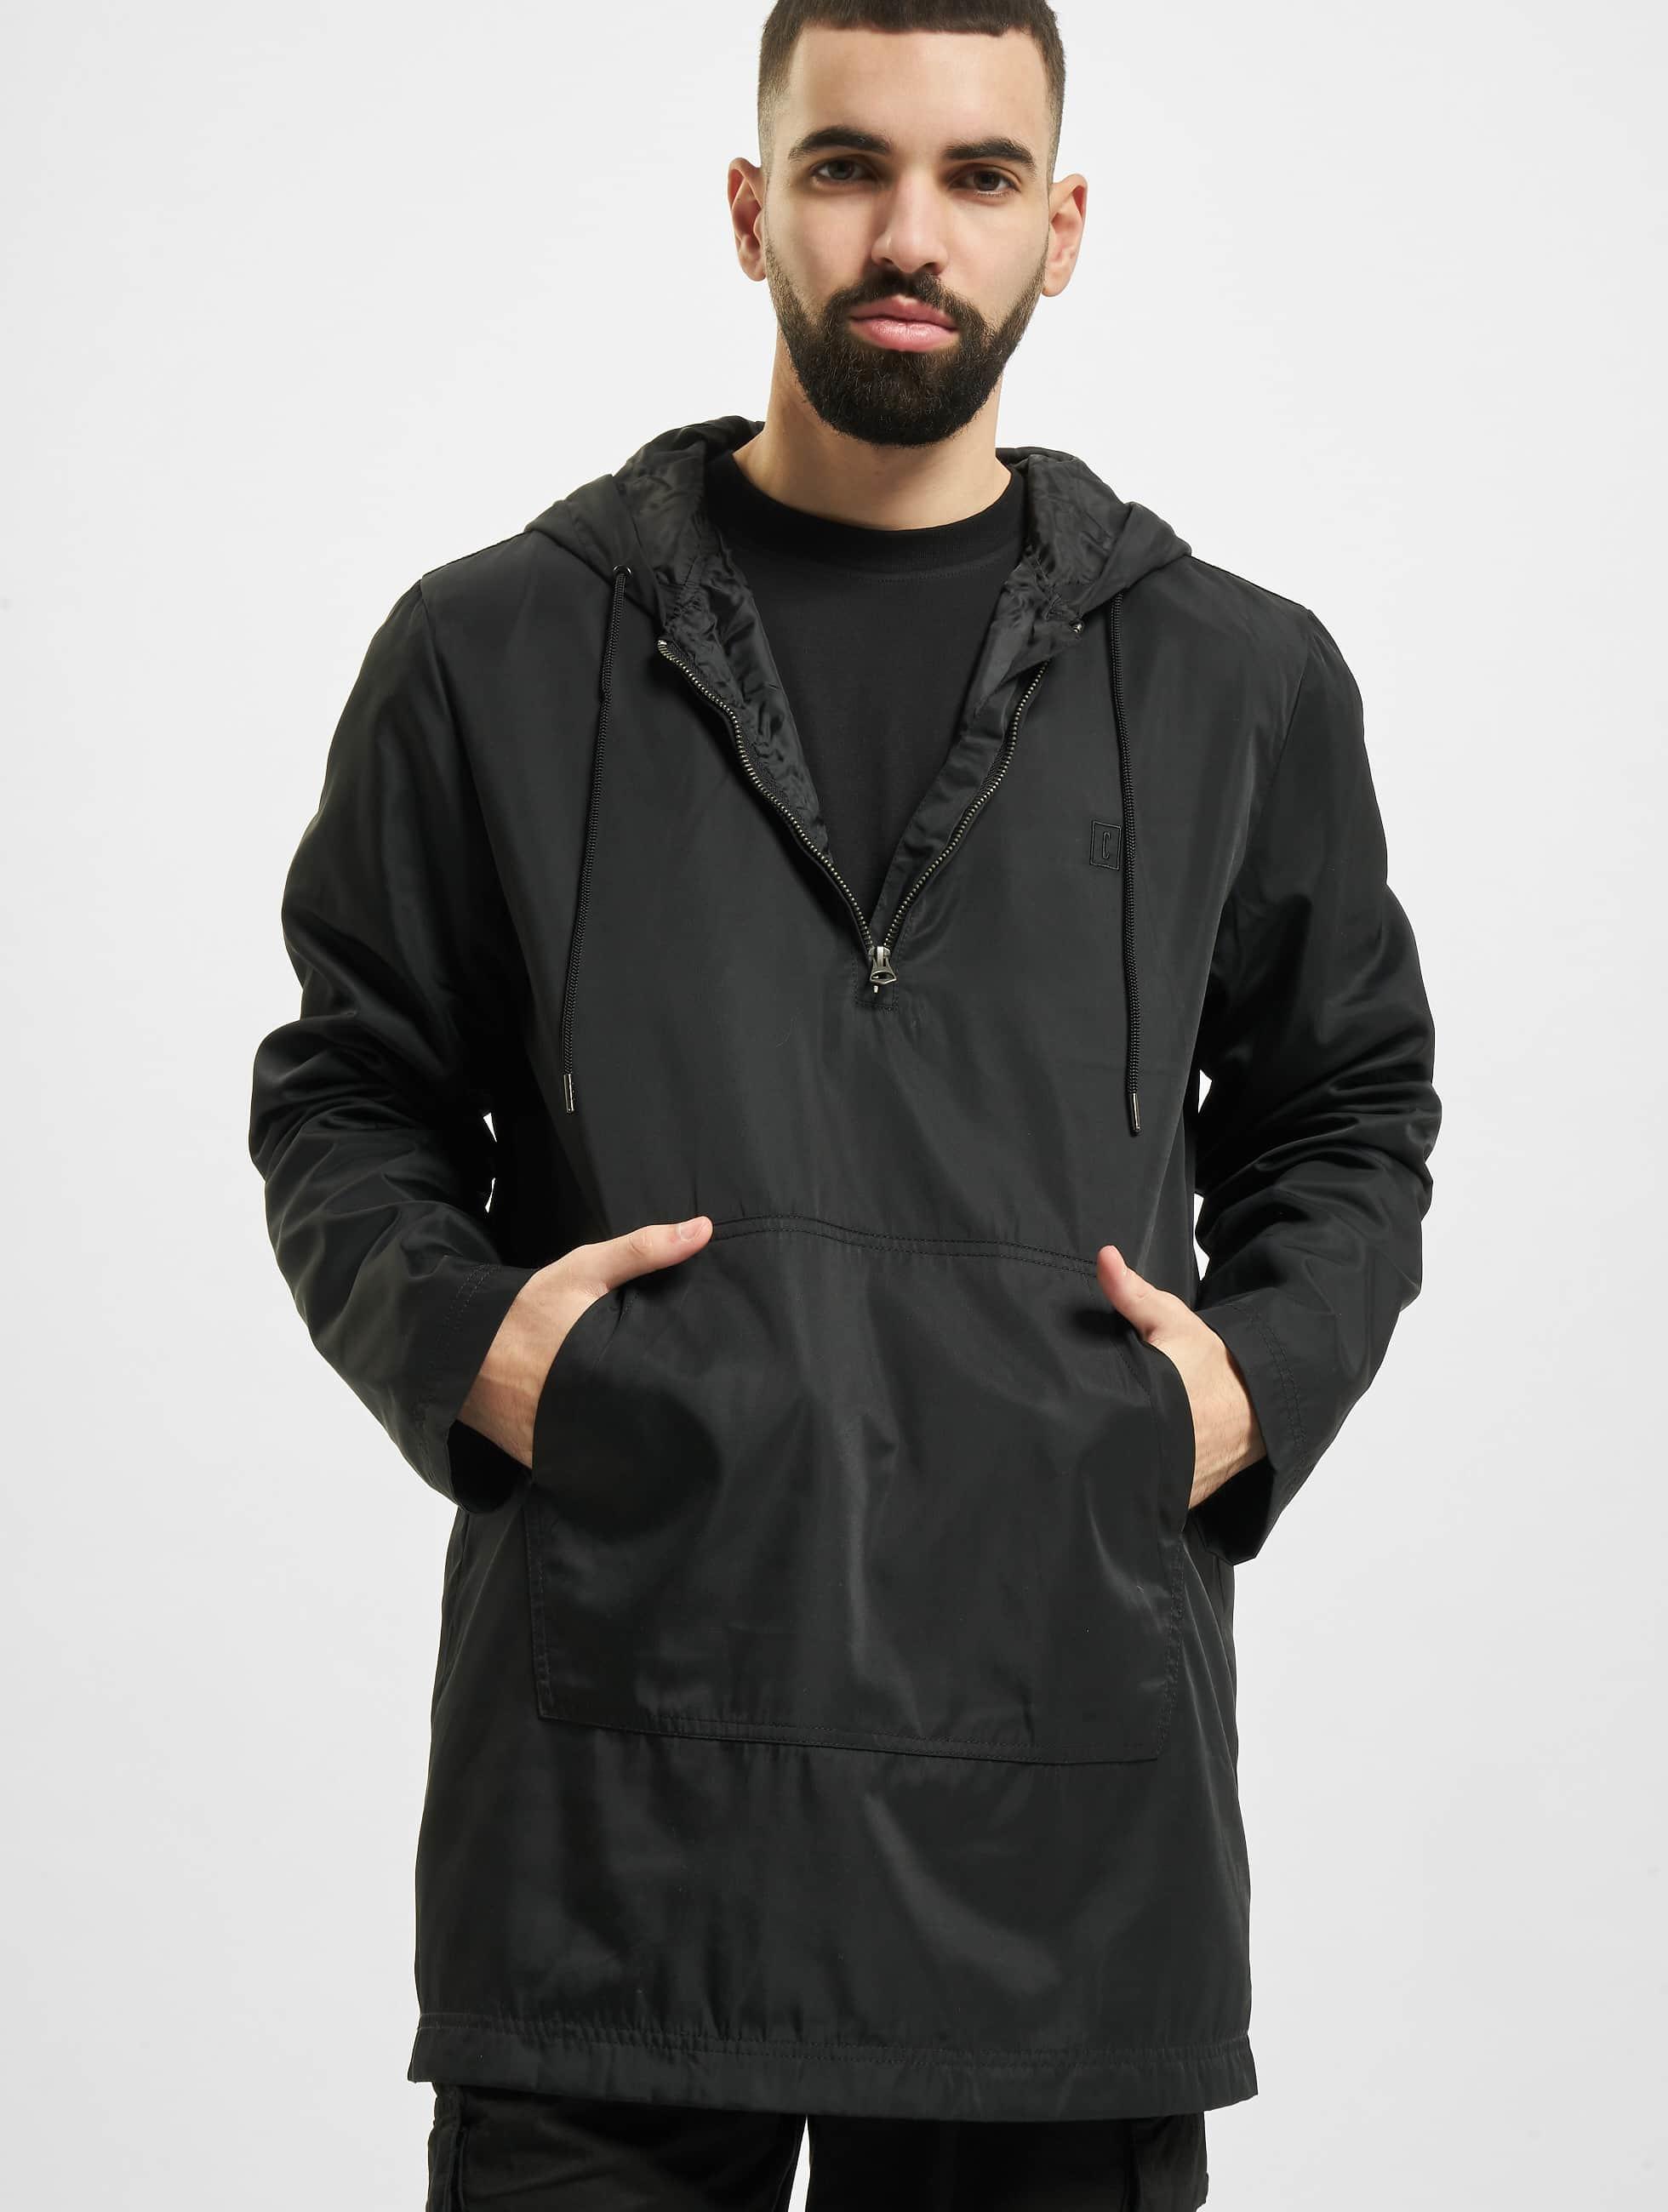 Cyprime / Lightweight Jacket Iridium in black XL